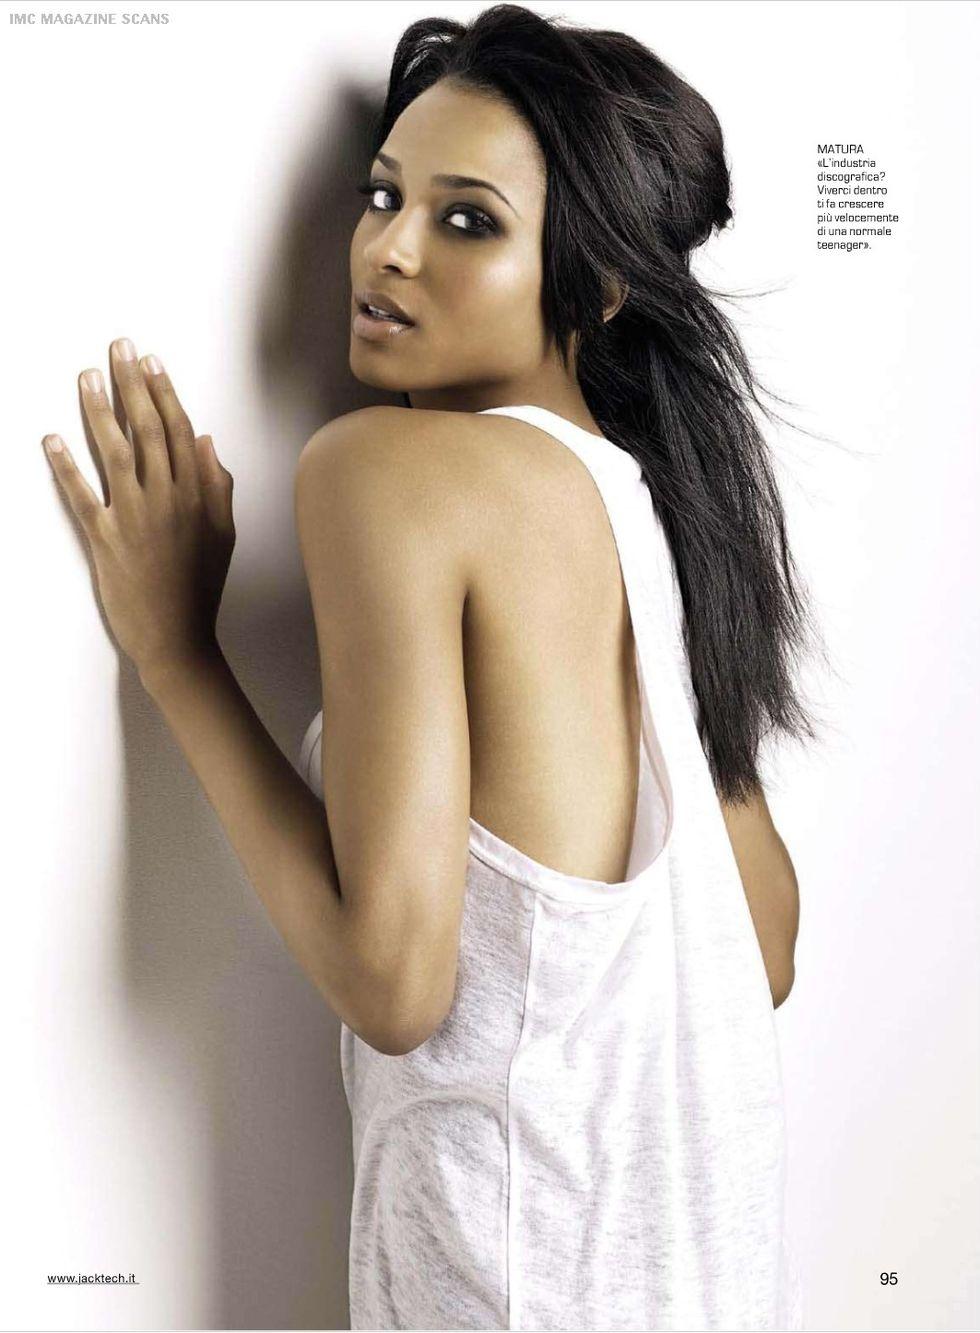 ciara-jack-magazine-february-2010-01